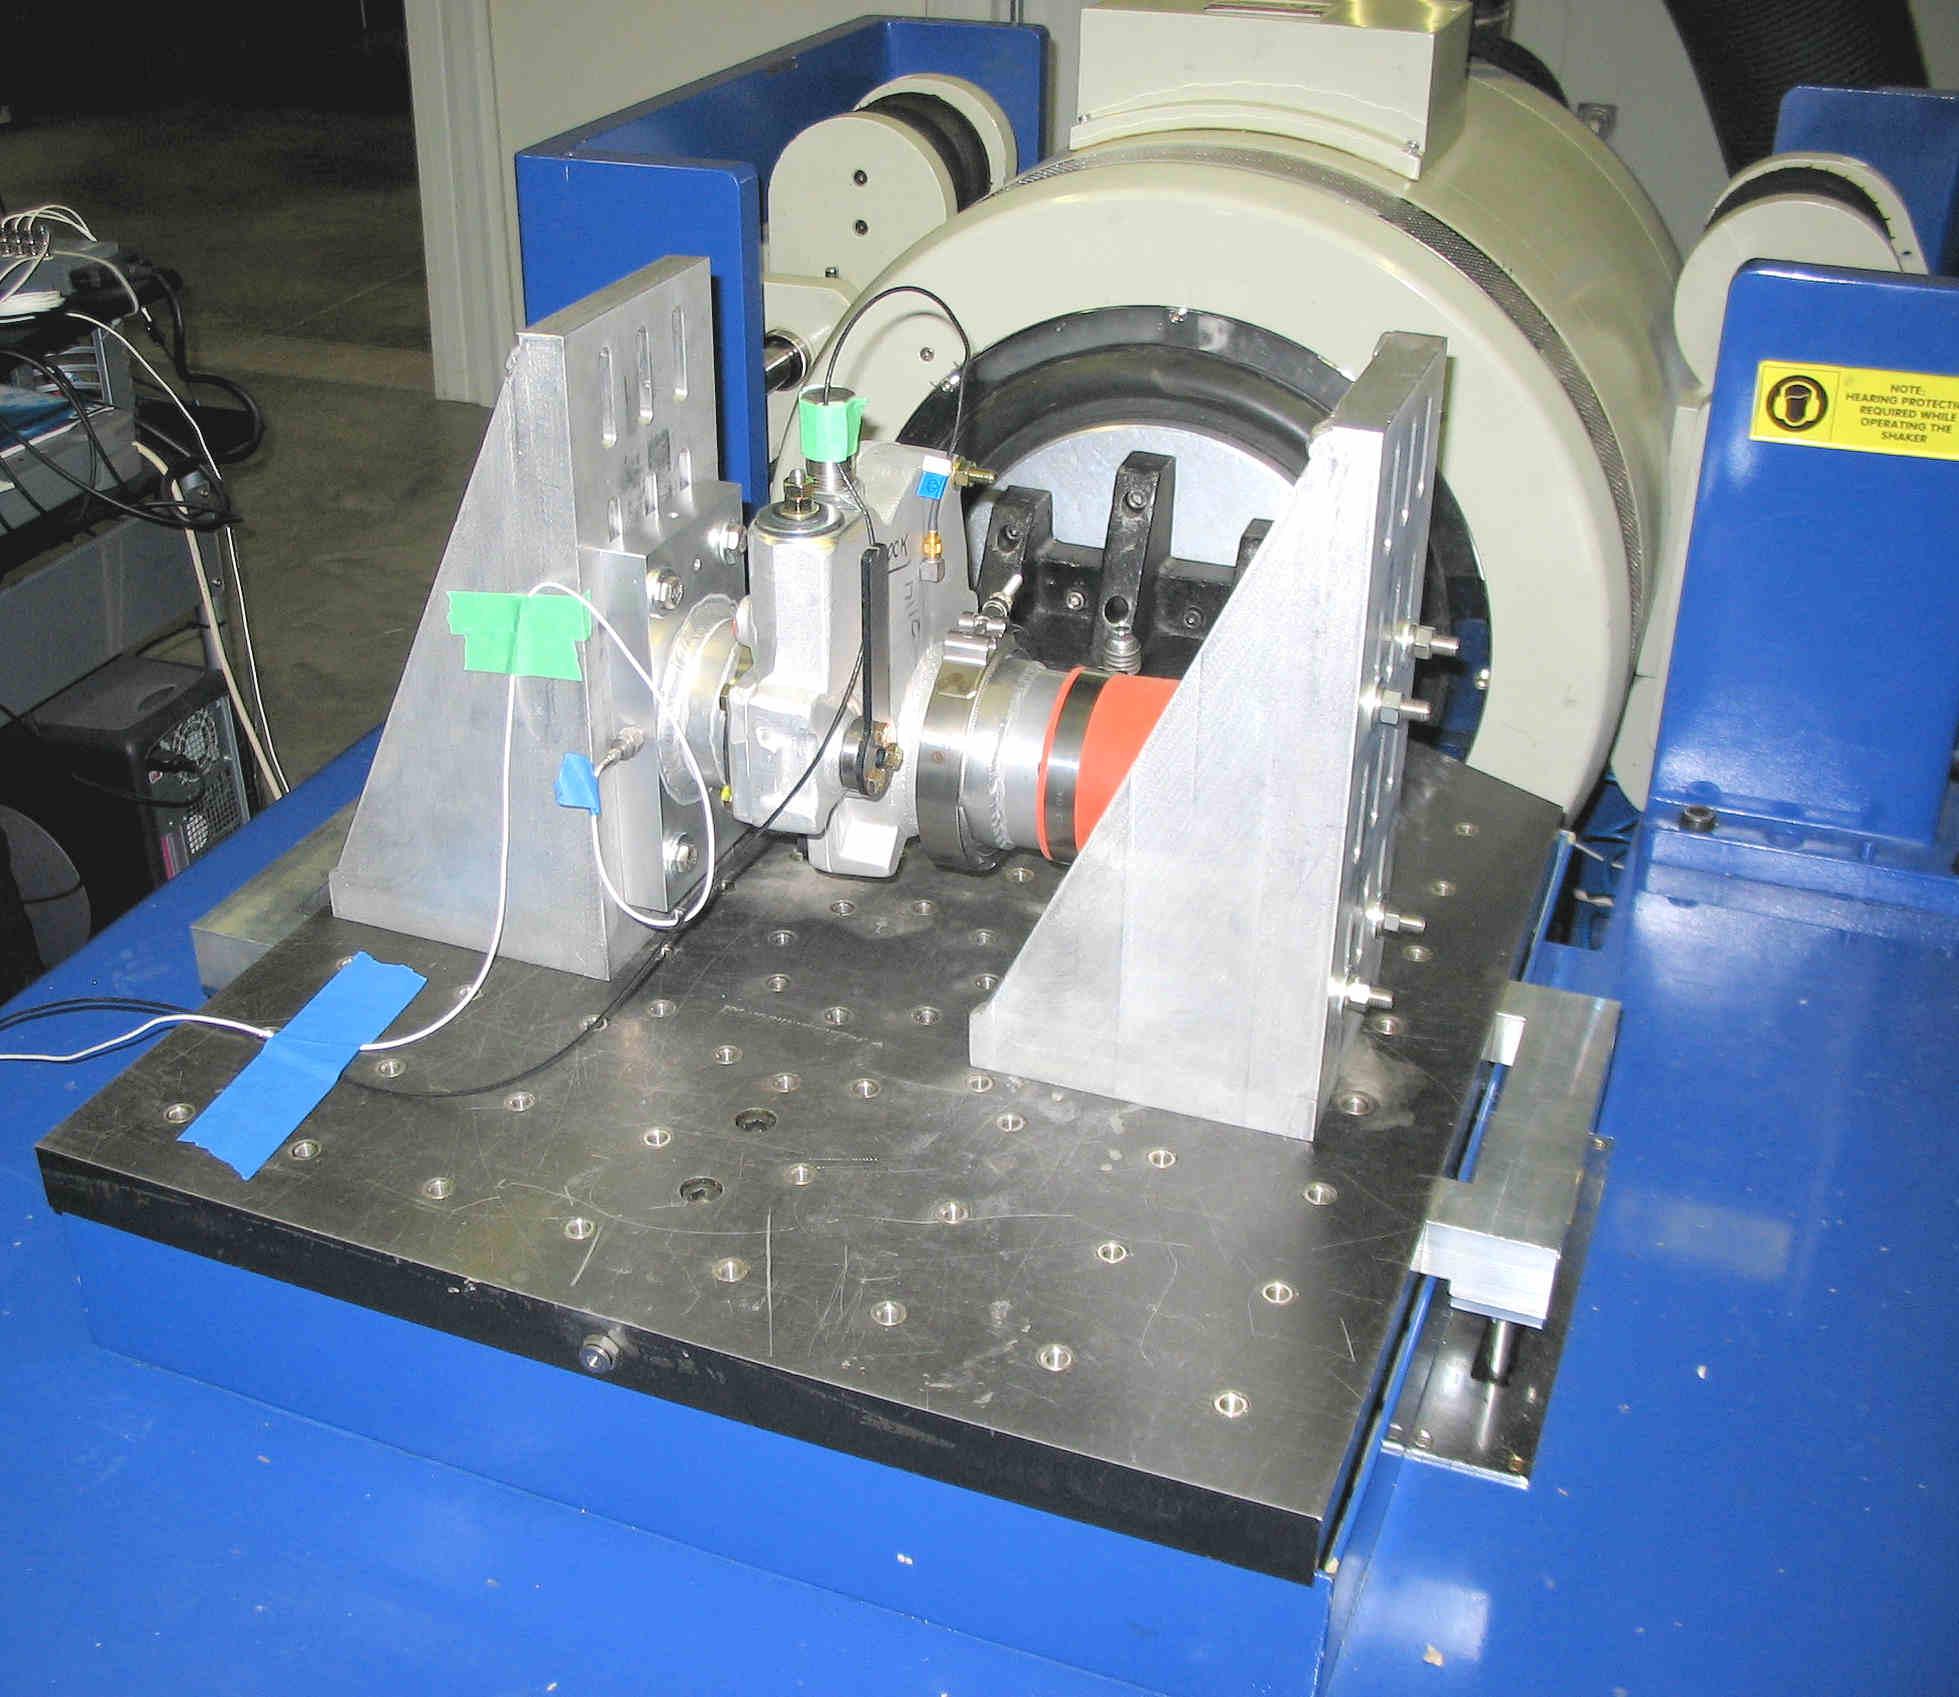 Vibration Testing Electro Dynamic Shaker System